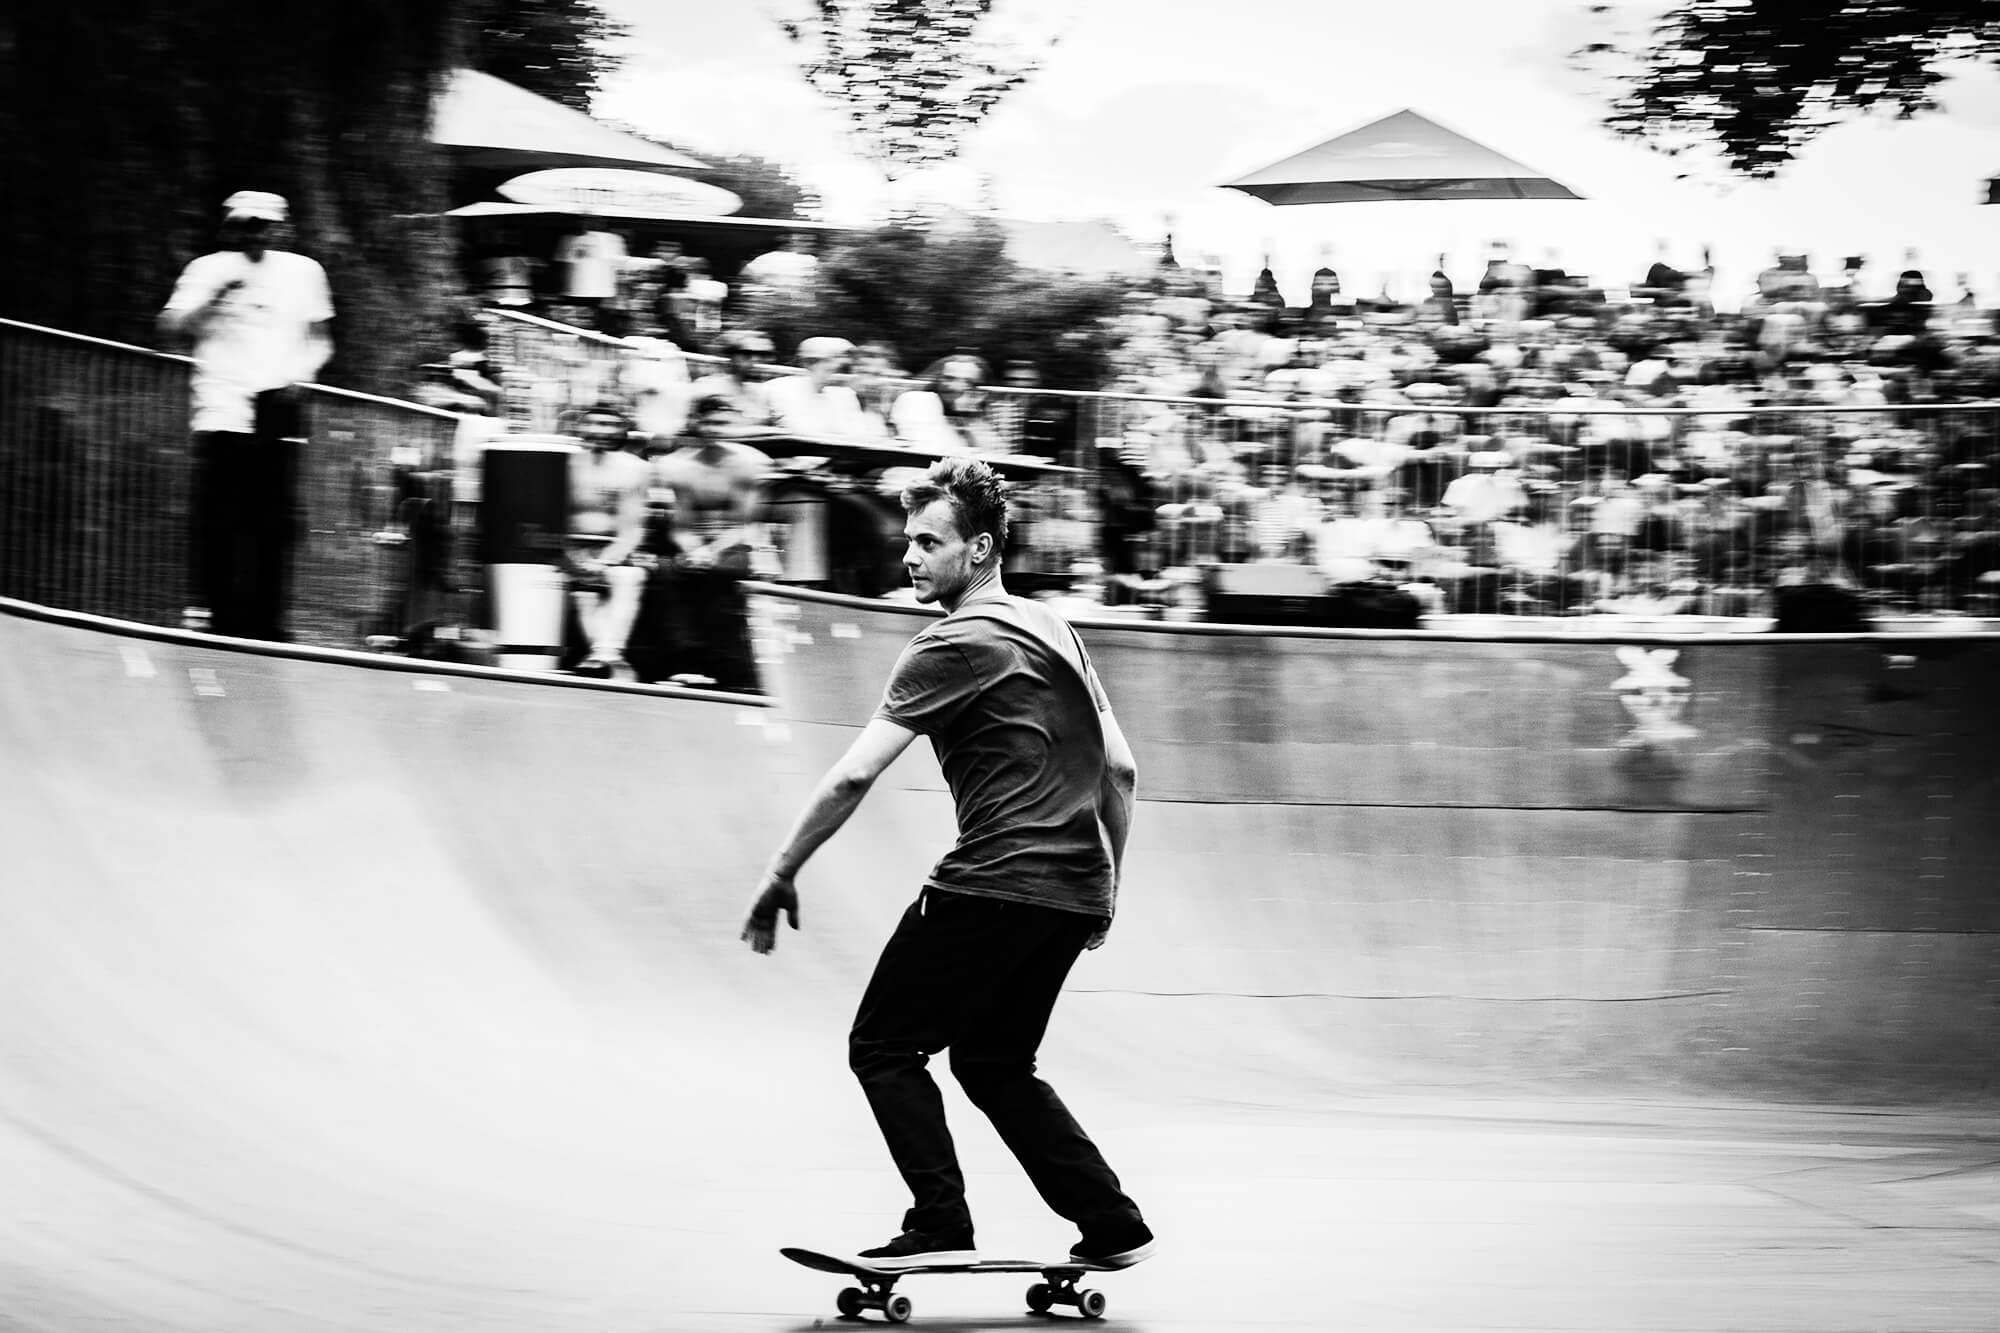 Skater | Lohserampe - Köln